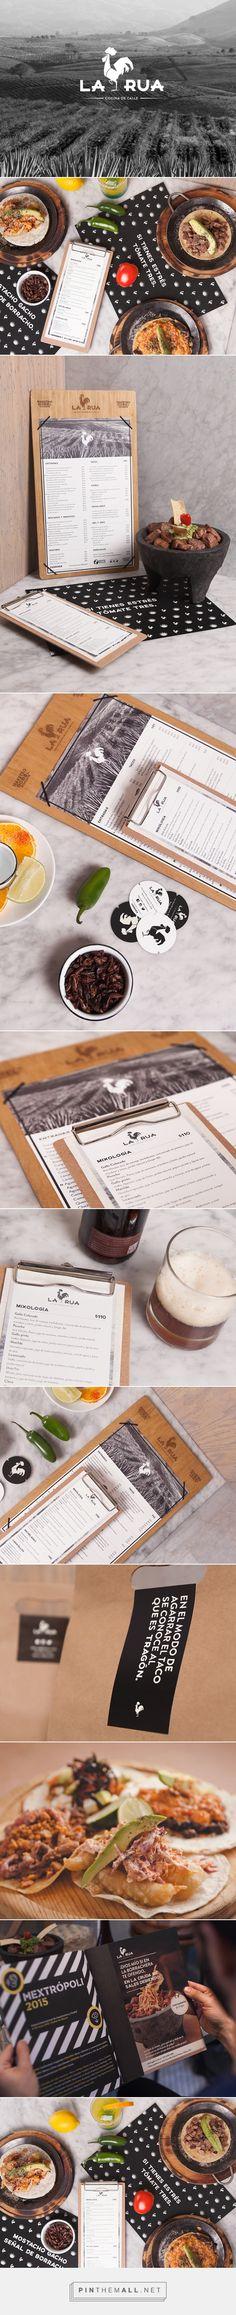 LA RUA Restaurant and Bar Branding and Menu Design by The Branding People | Fivestar Branding Agency – Design and Branding Agency & Curated Inspiration Gallery